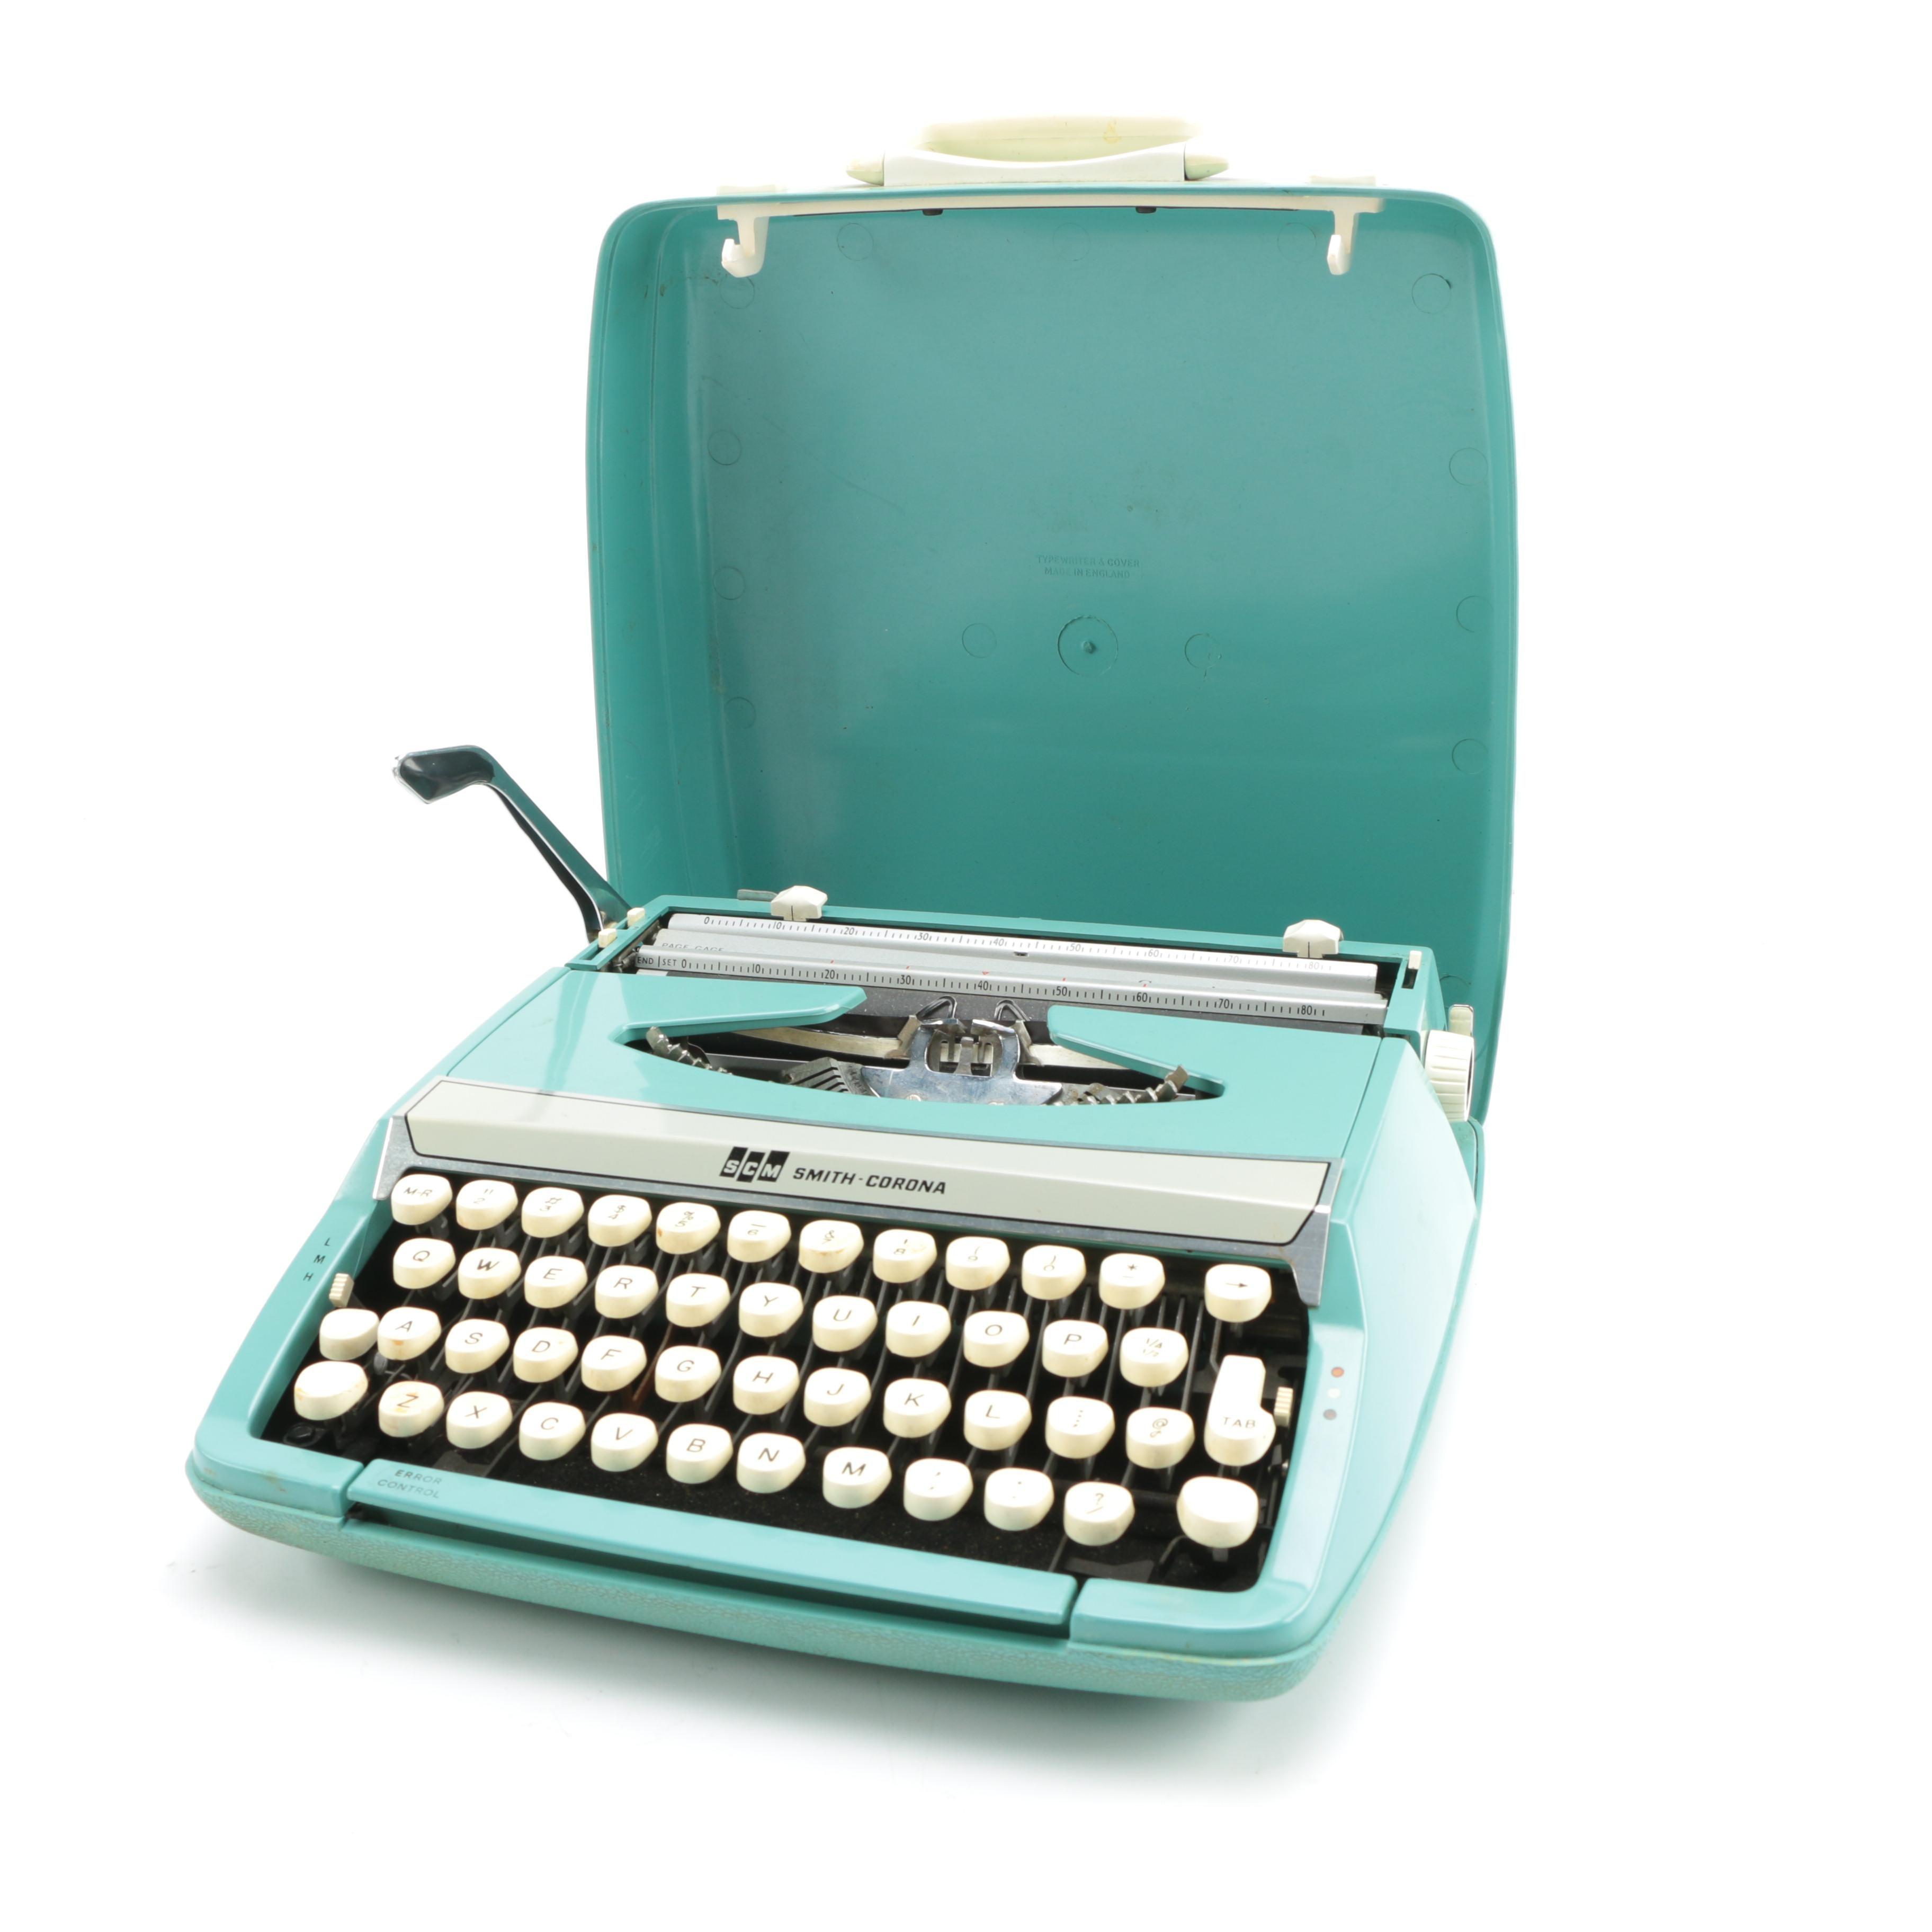 1960s-Era Smith-Corona Corsair Deluxe Portable Typewriter